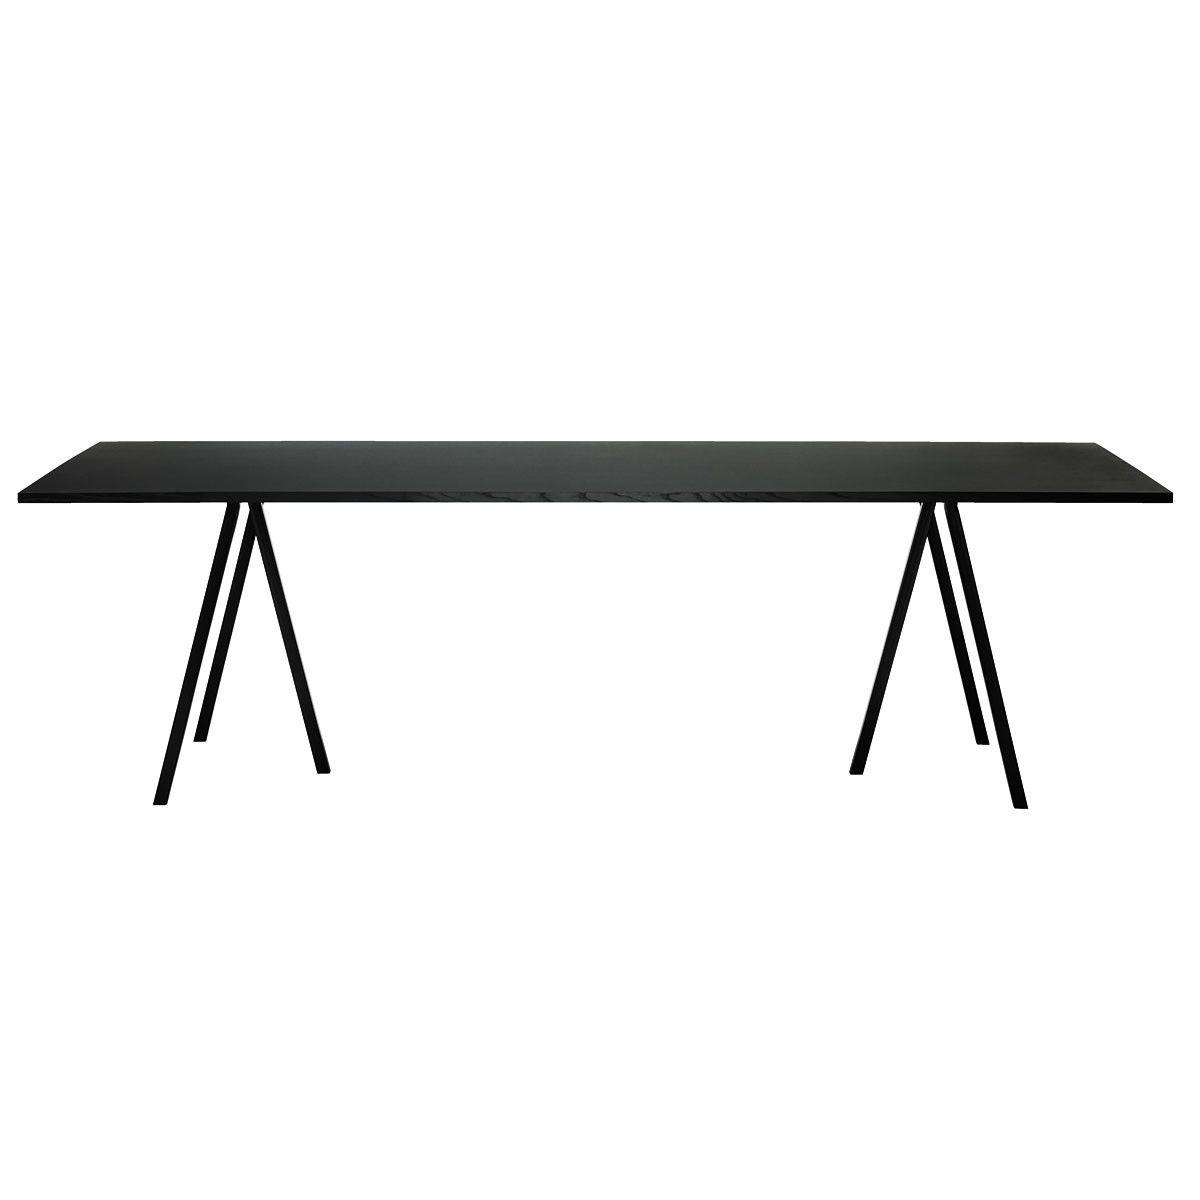 Hay Tischböcke hay loop stand table 180 black desks interiors and room